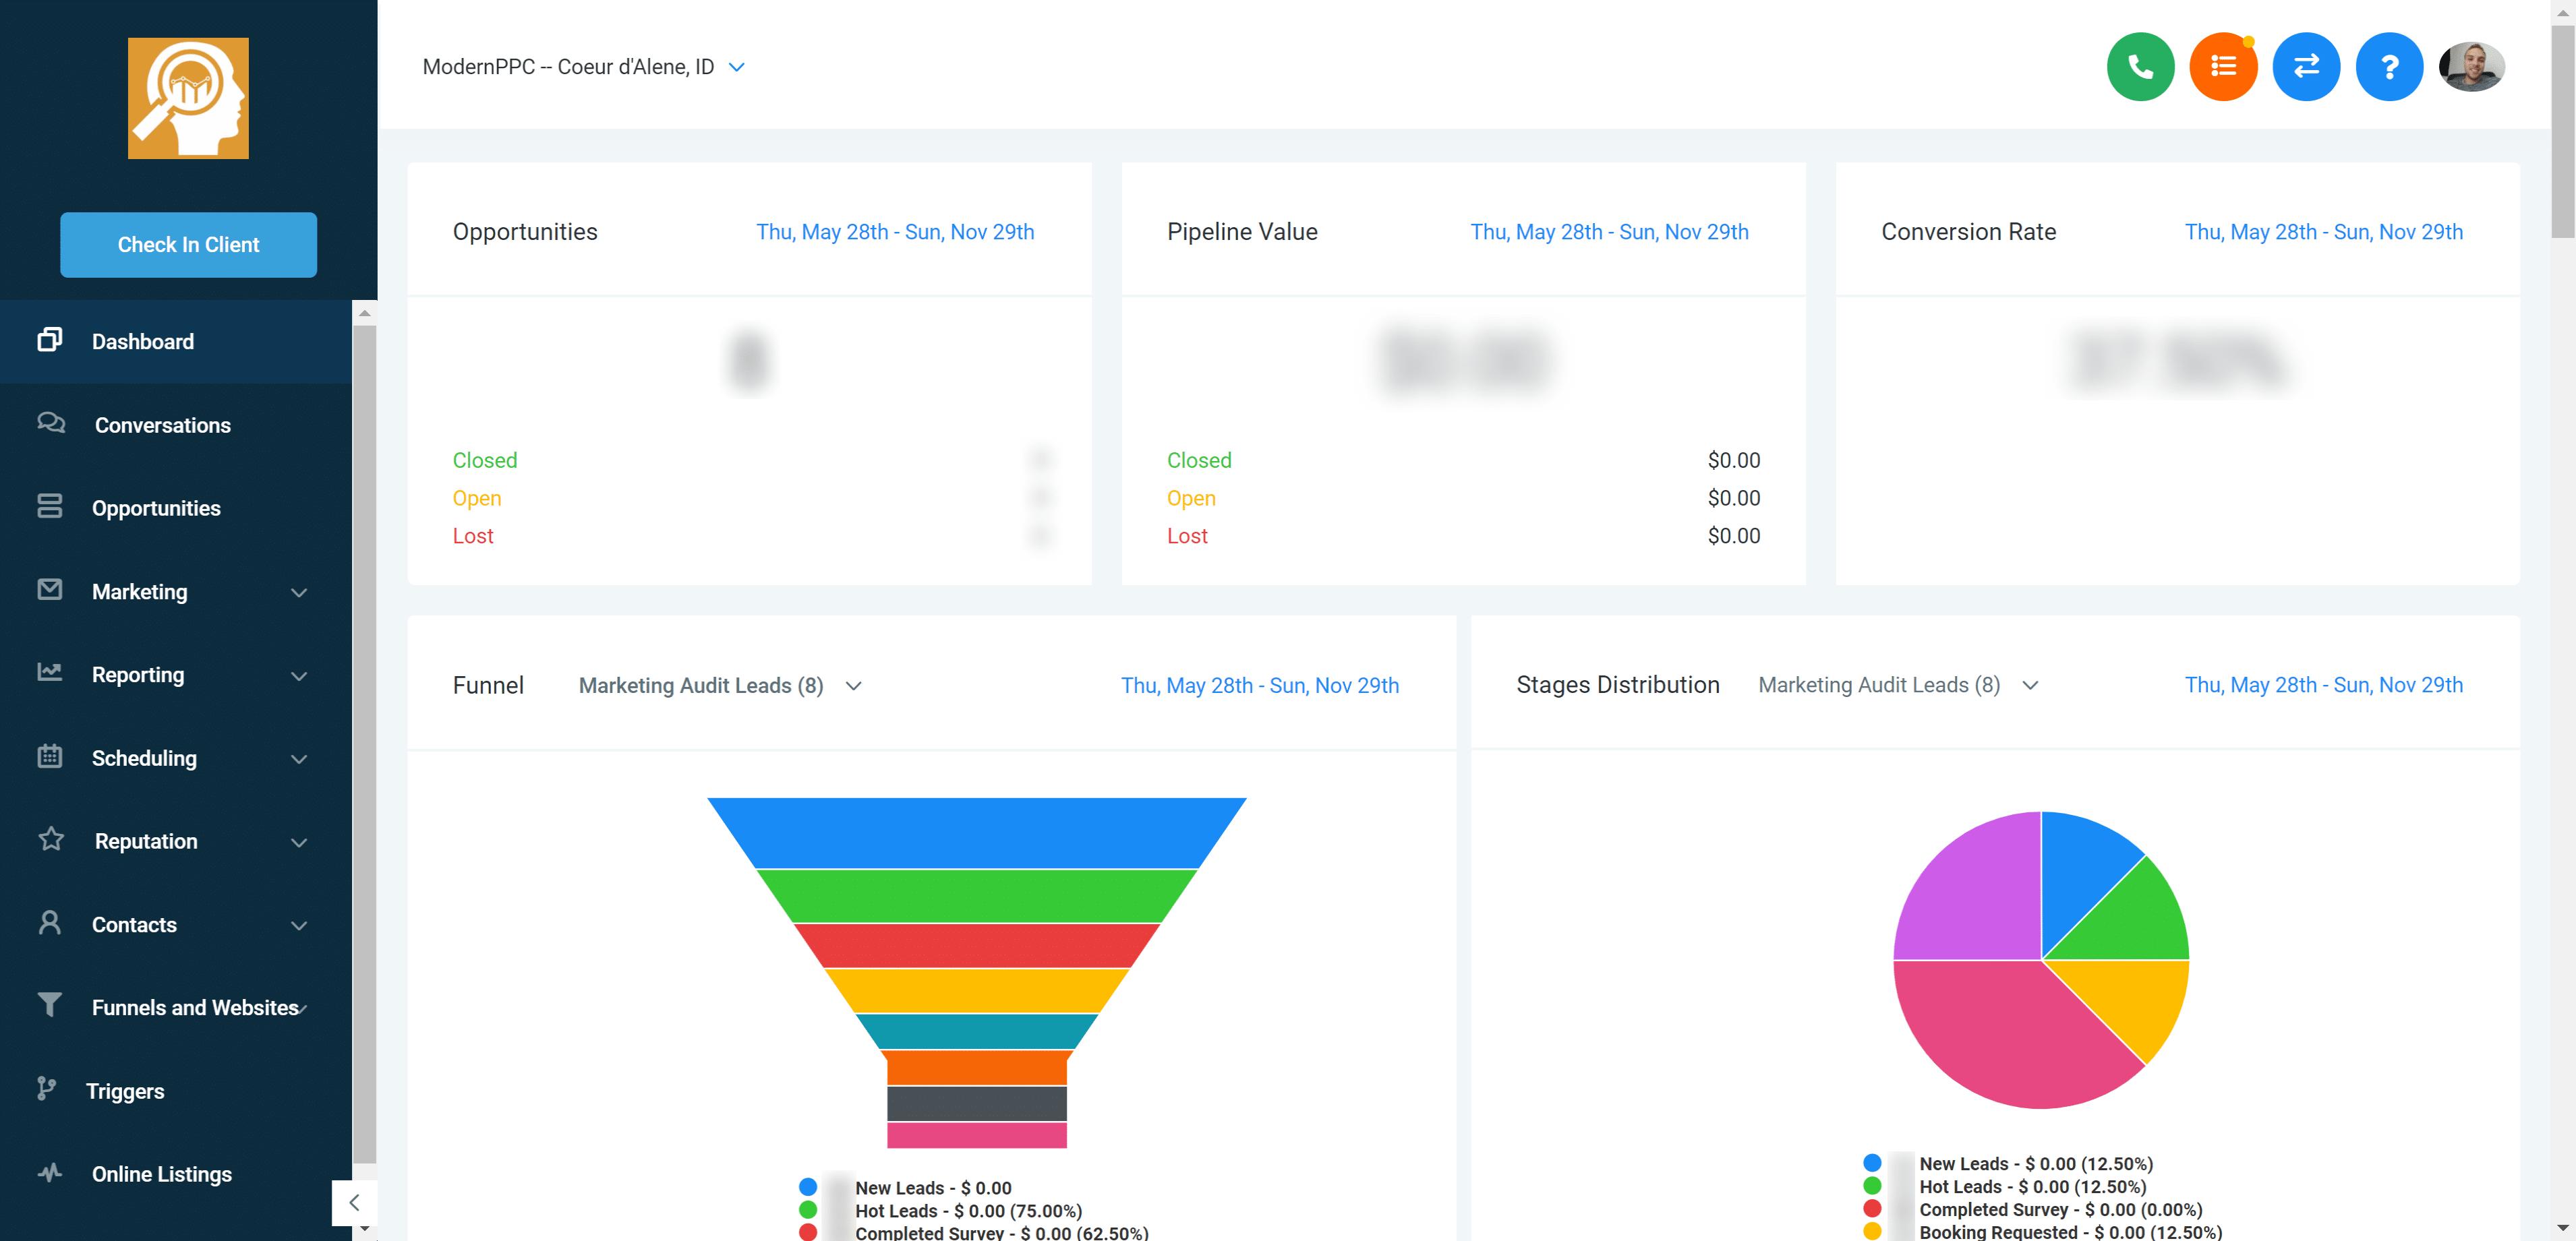 ModernPPC custom CRM dashboard